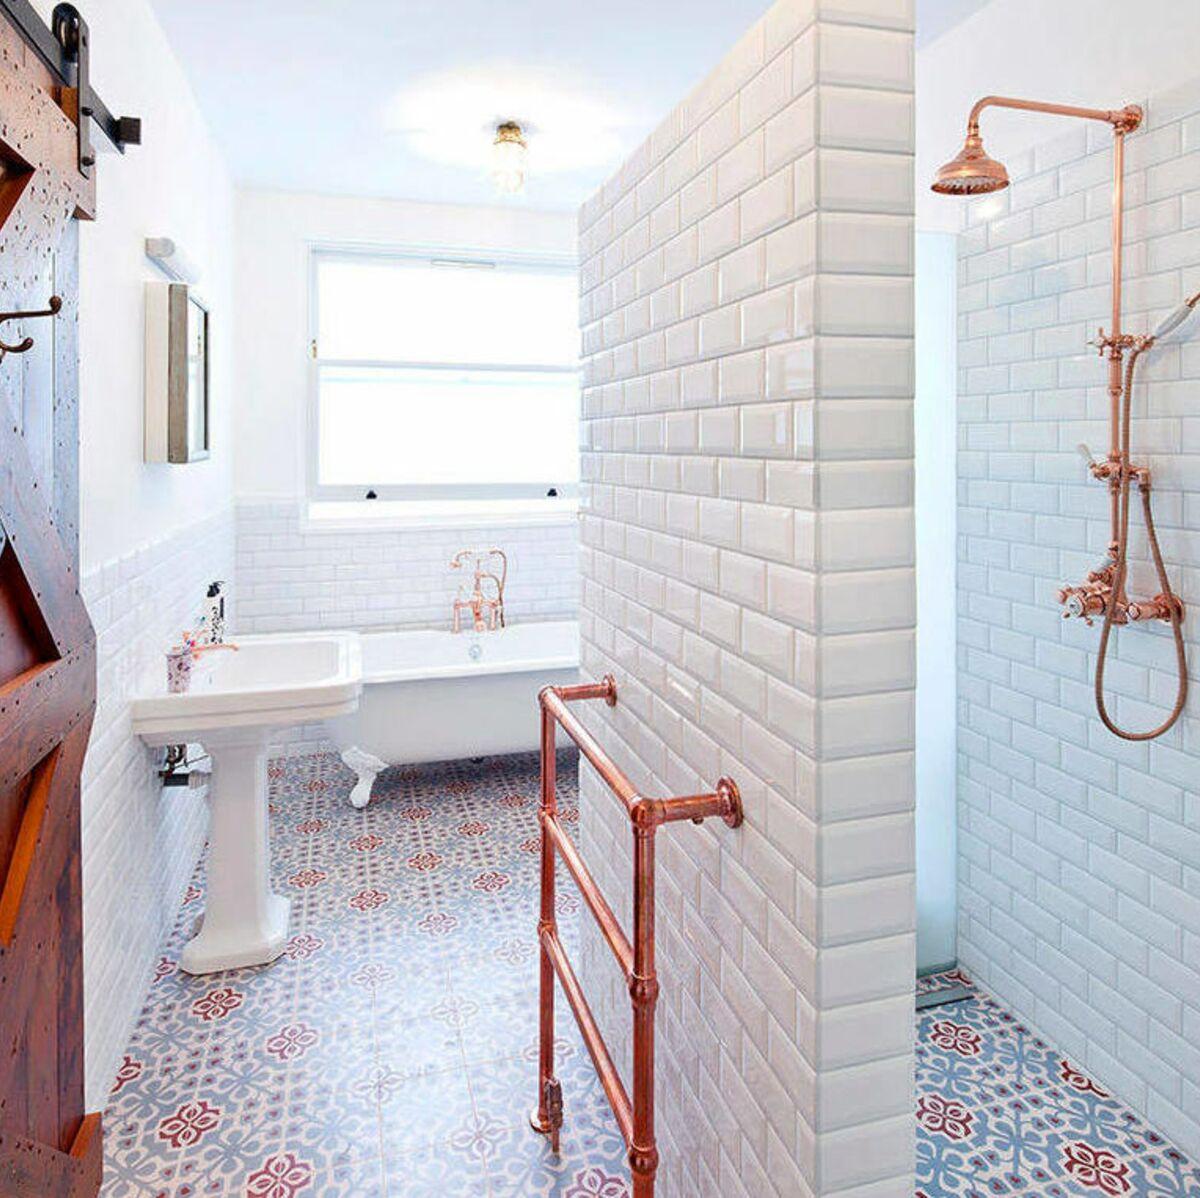 carreler une salle de bains